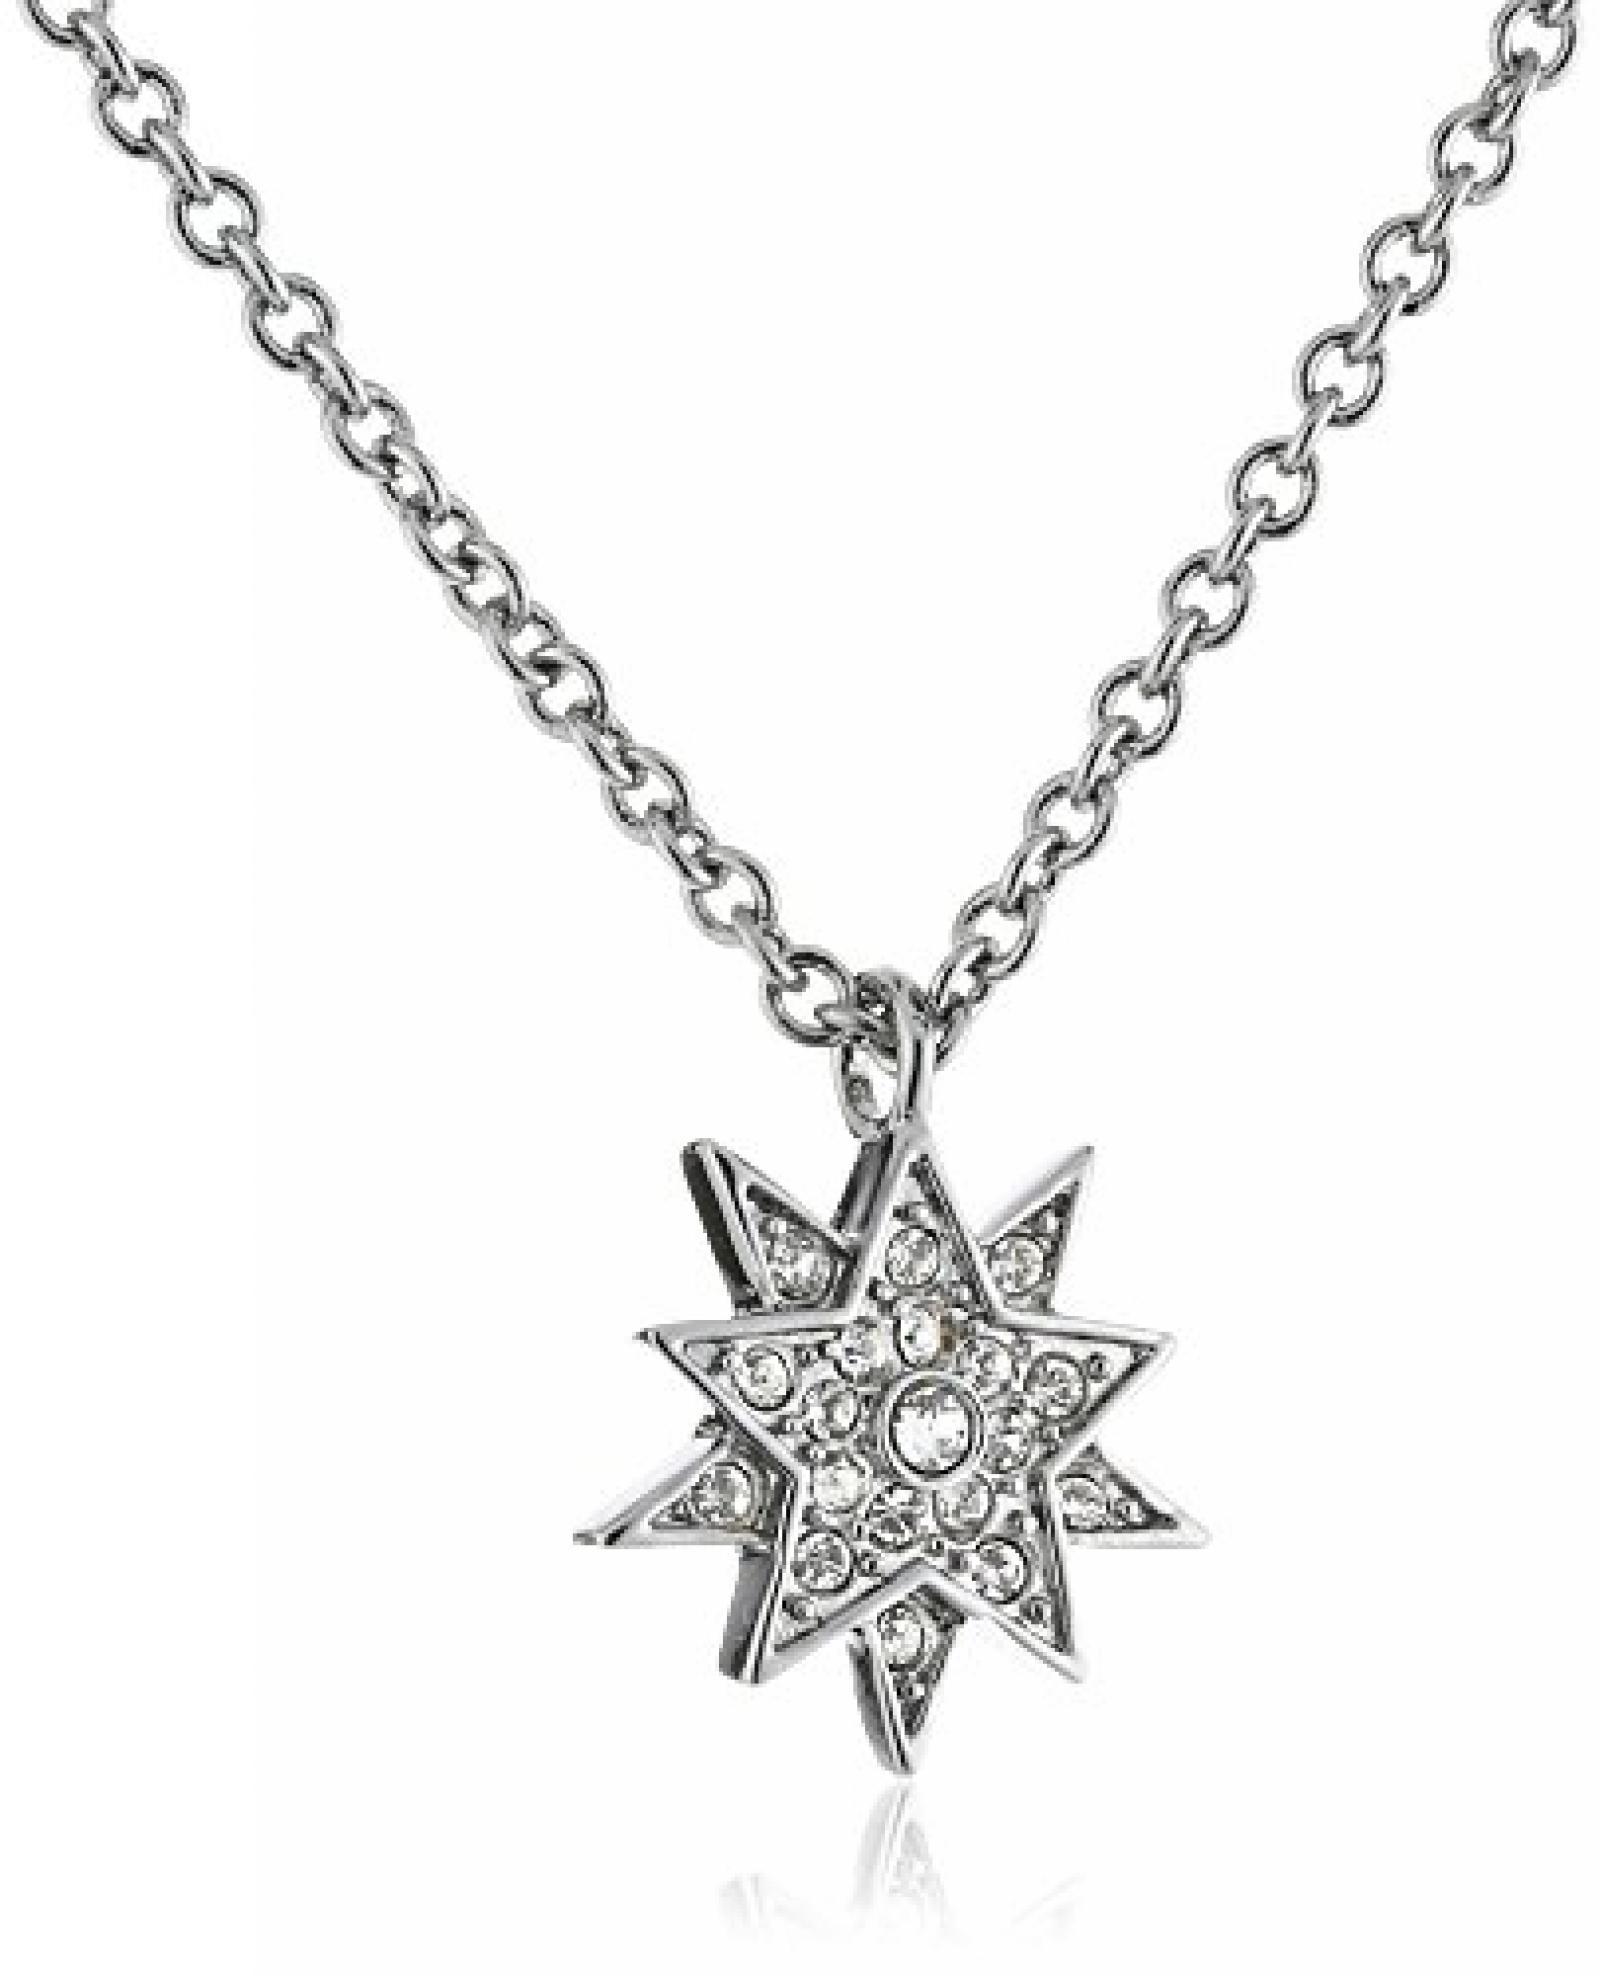 Dyrberg/Kern Damen Halskette Versilbertes Metall Kristall Swarovski 336175